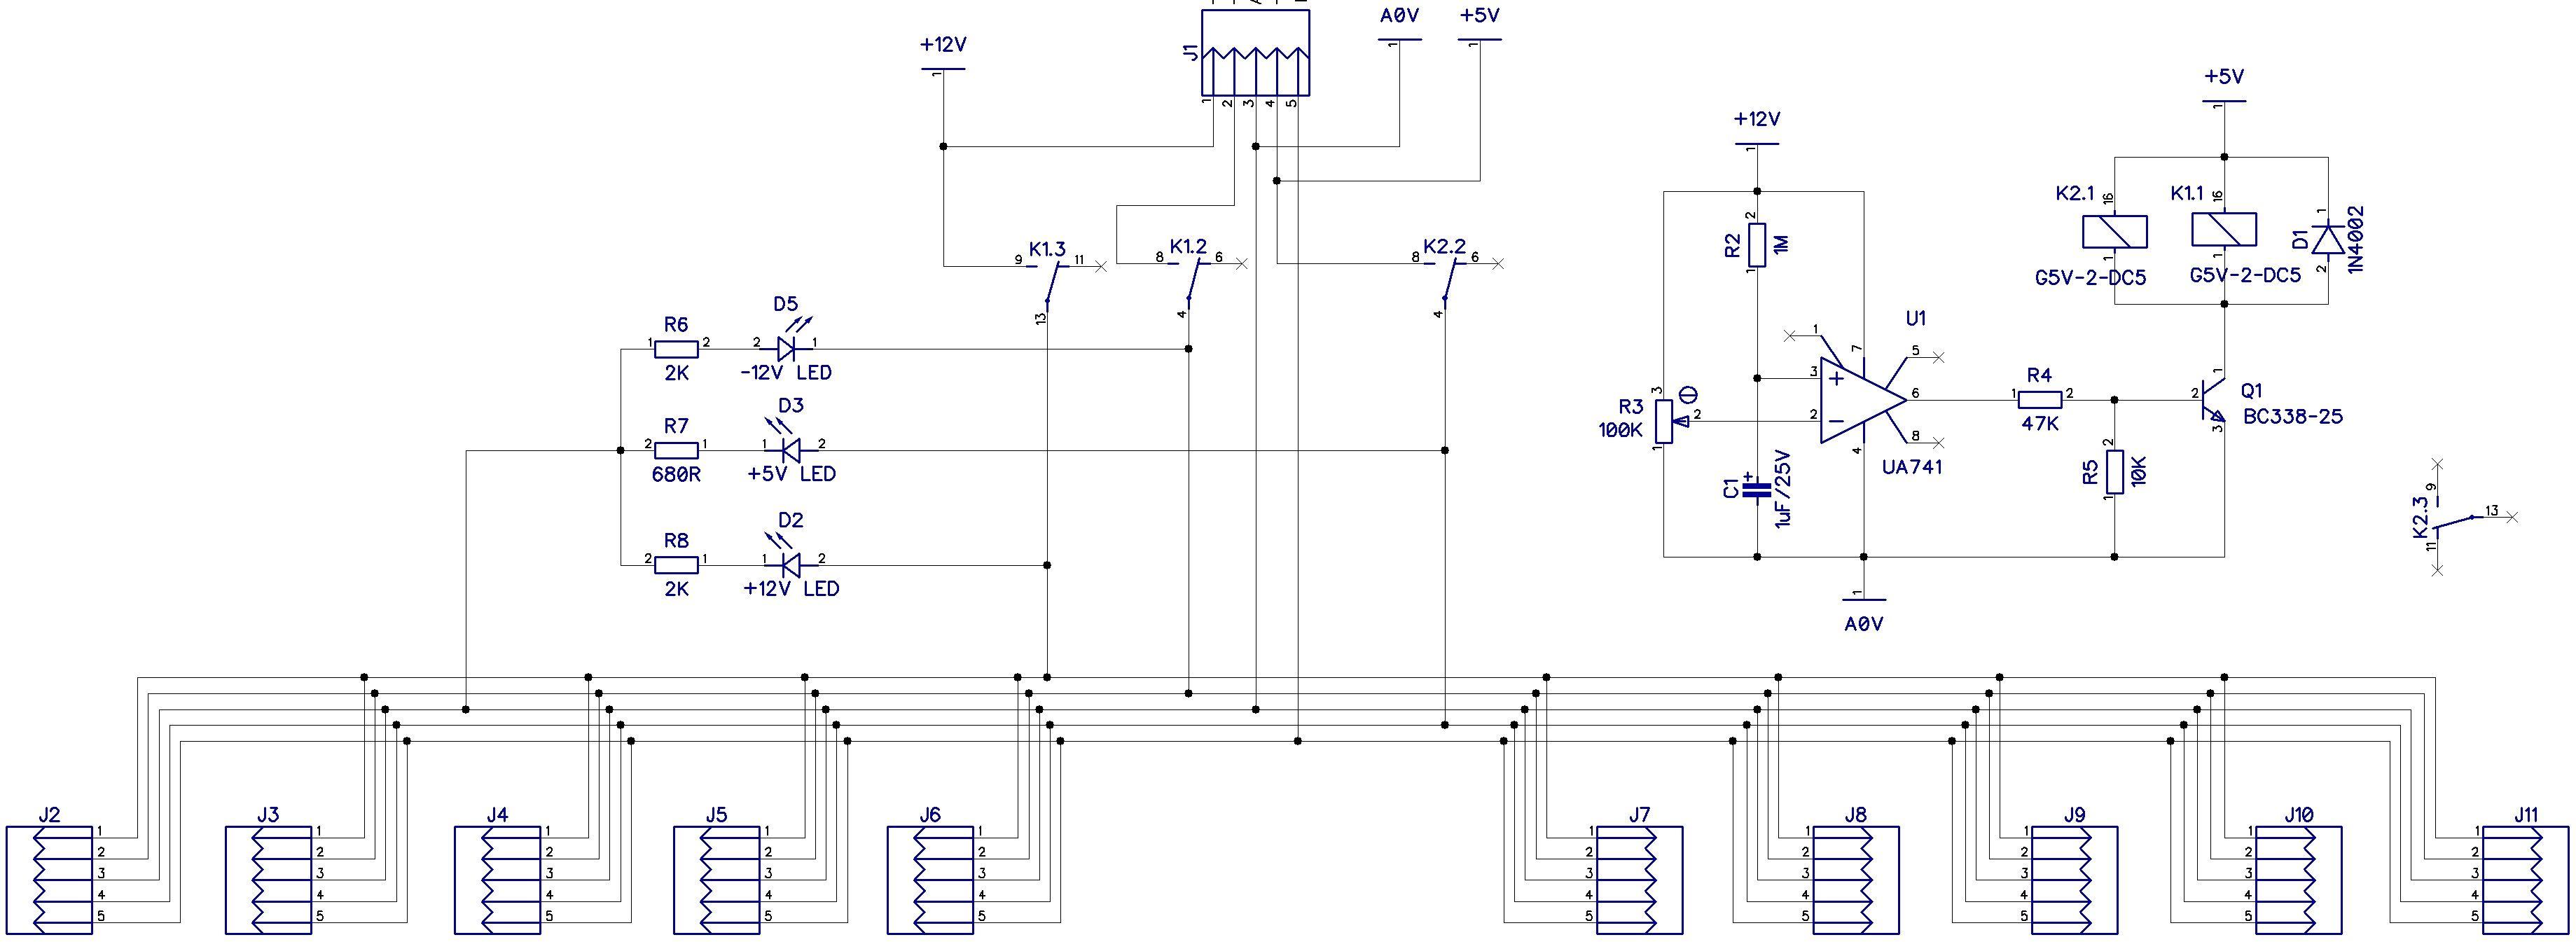 small resolution of panel board schematic database wiring diagram panel board schematic panel board schematic